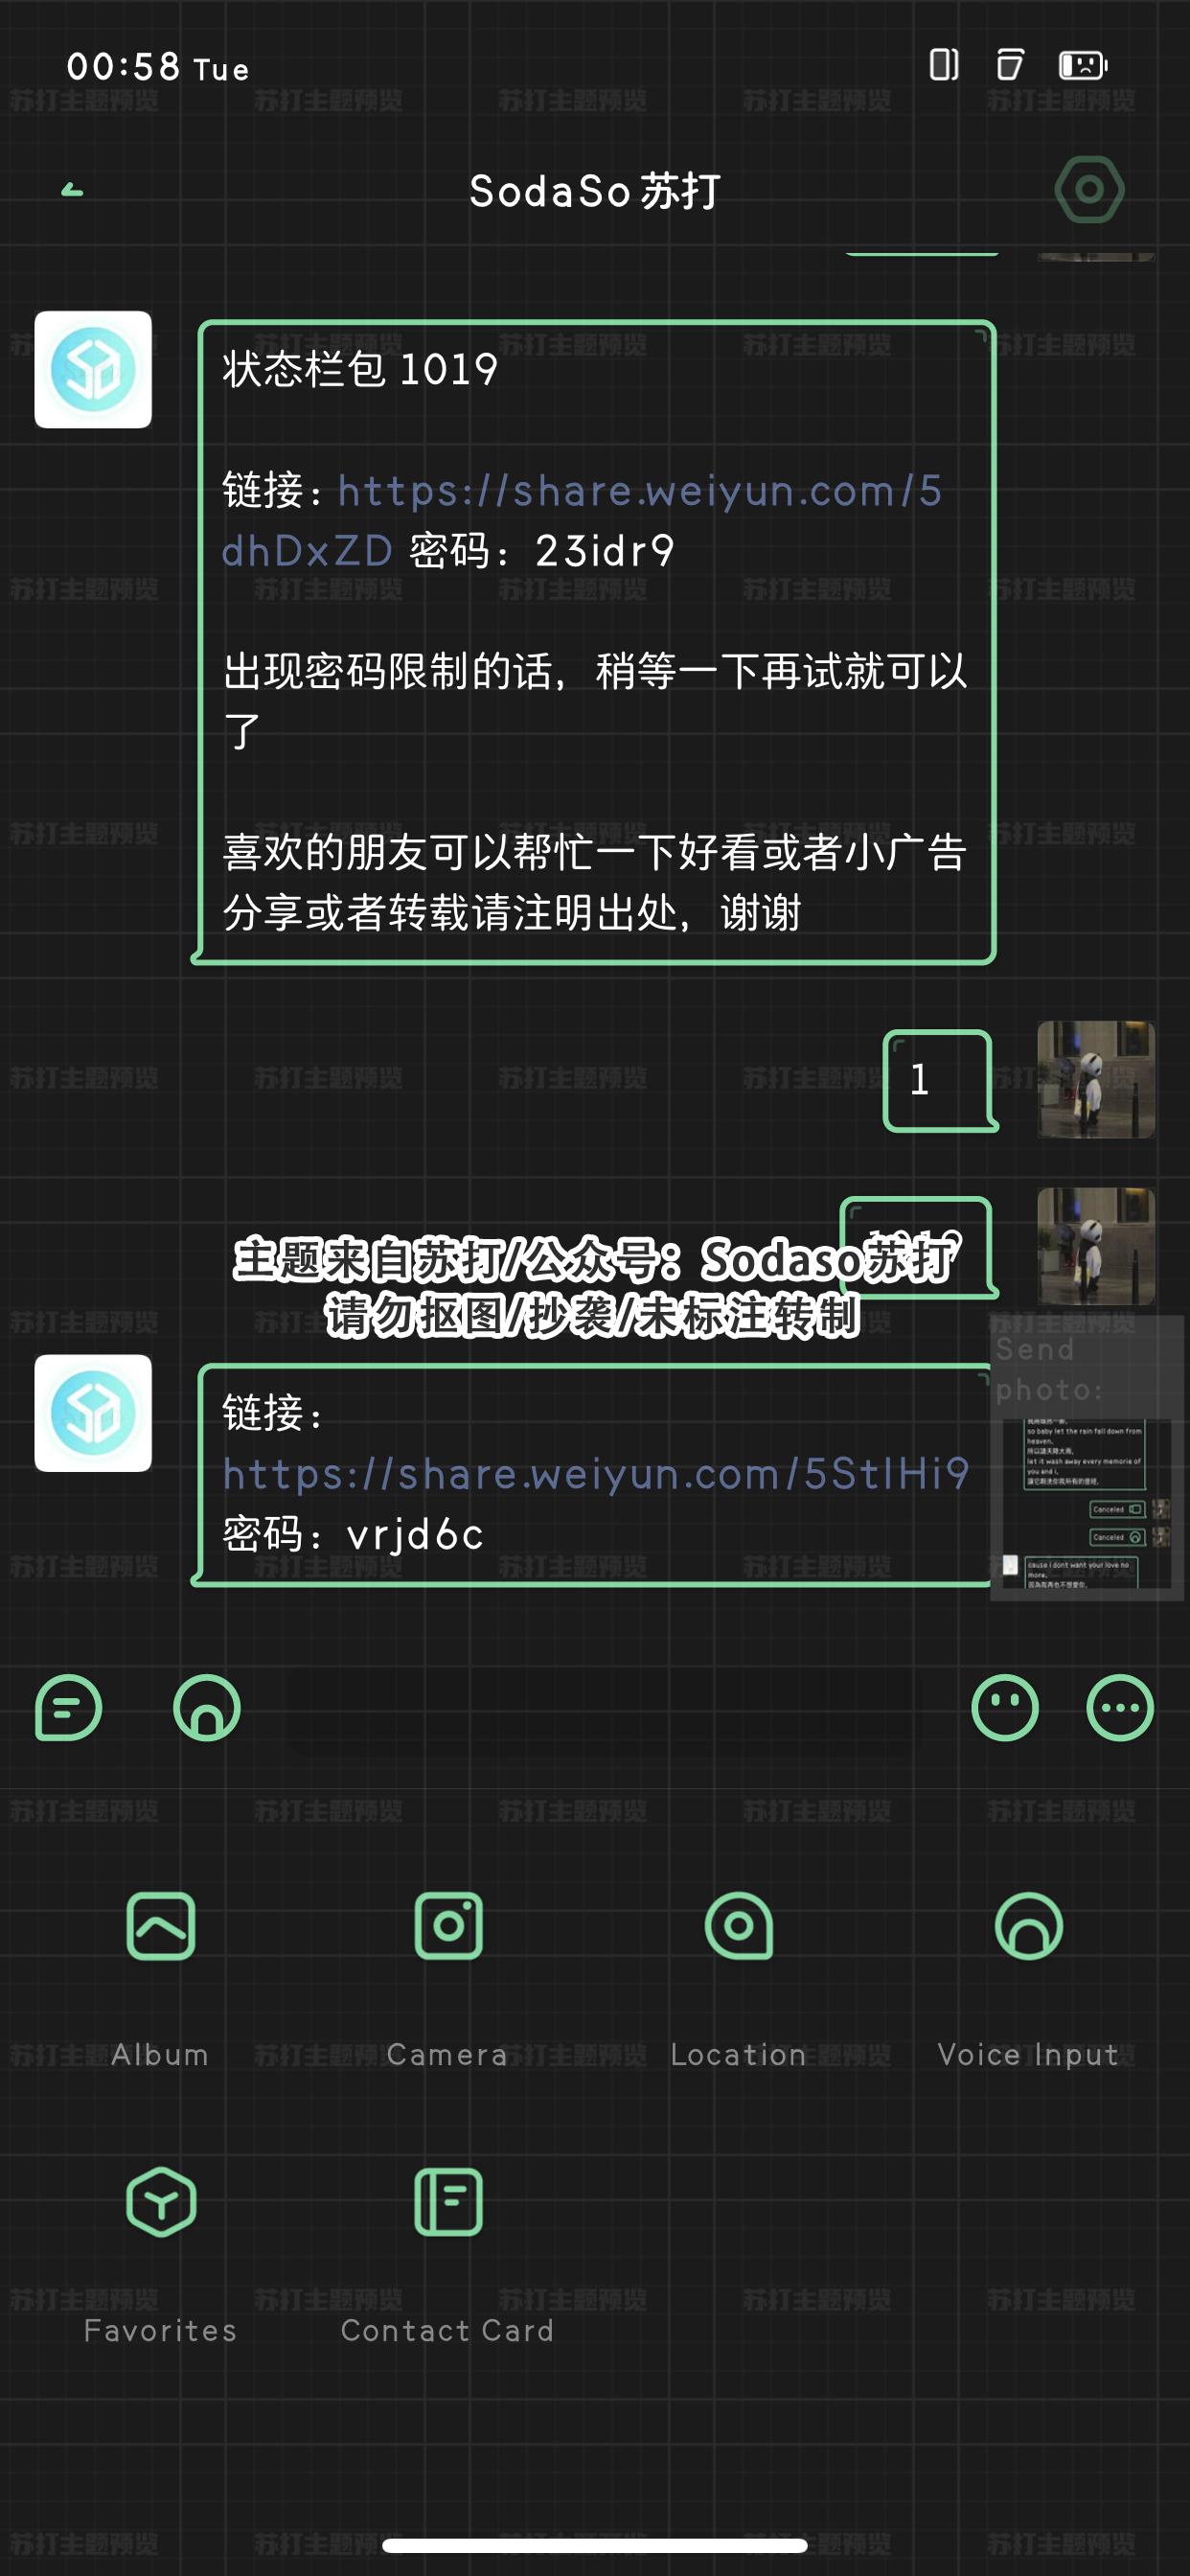 FriesDark WeChatTheme(暗黑版微信主题) - 1.11